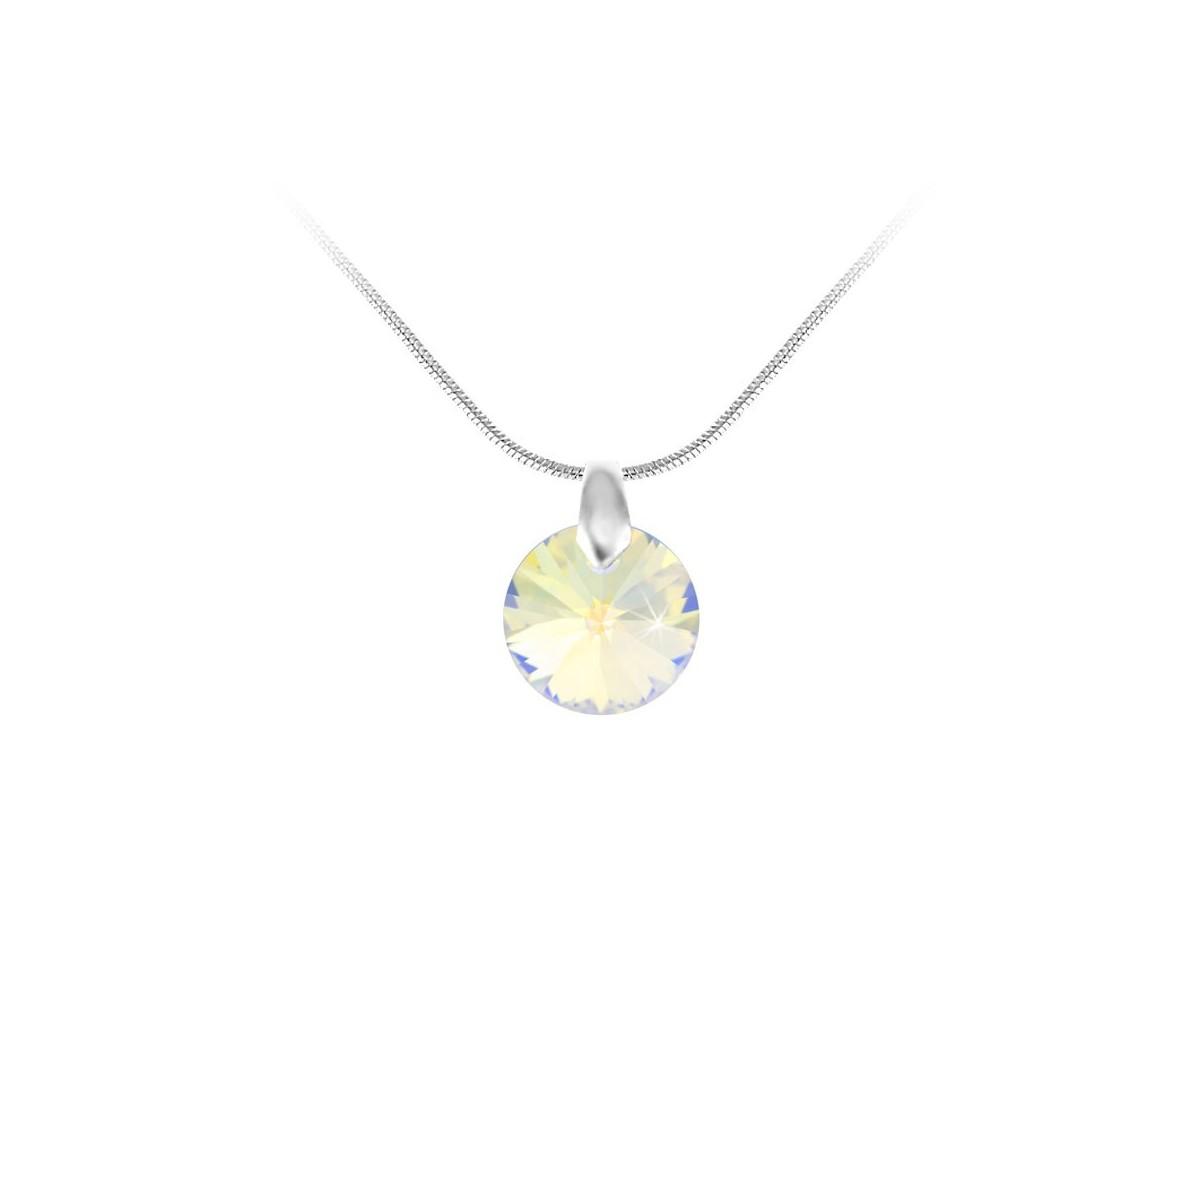 Collier argenté So Charm made with Crystal from Swarovski irisé